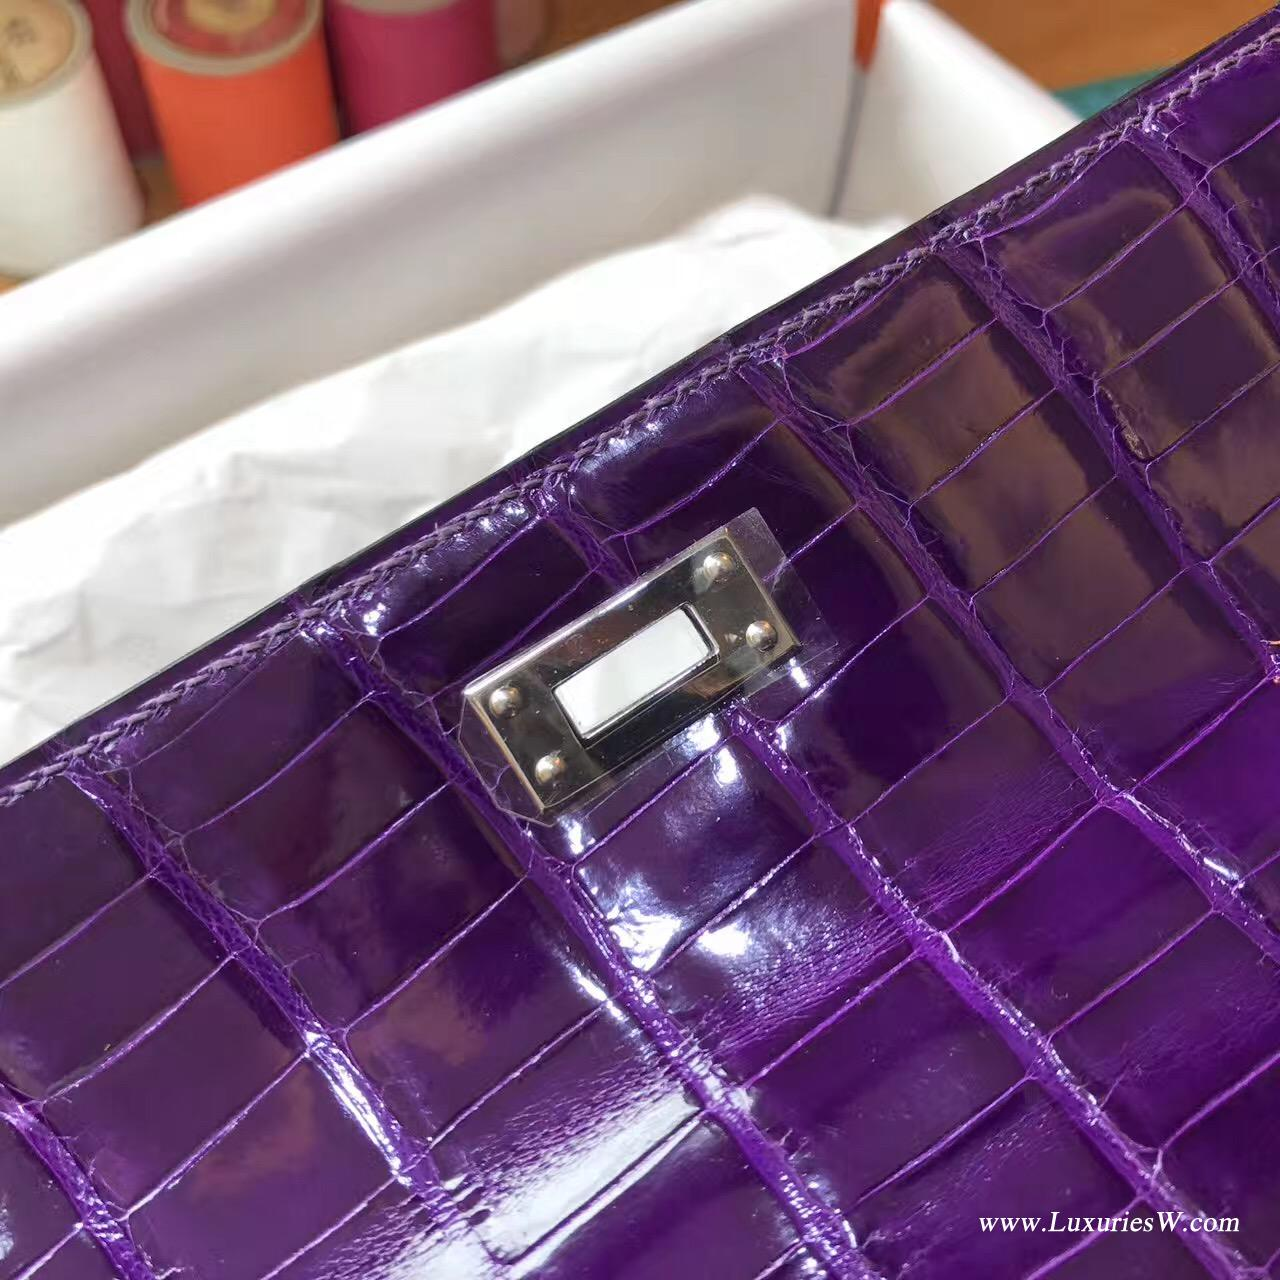 Hermes Mini Kelly鳄鱼宴会手包9G Amethyst紫水晶银扣